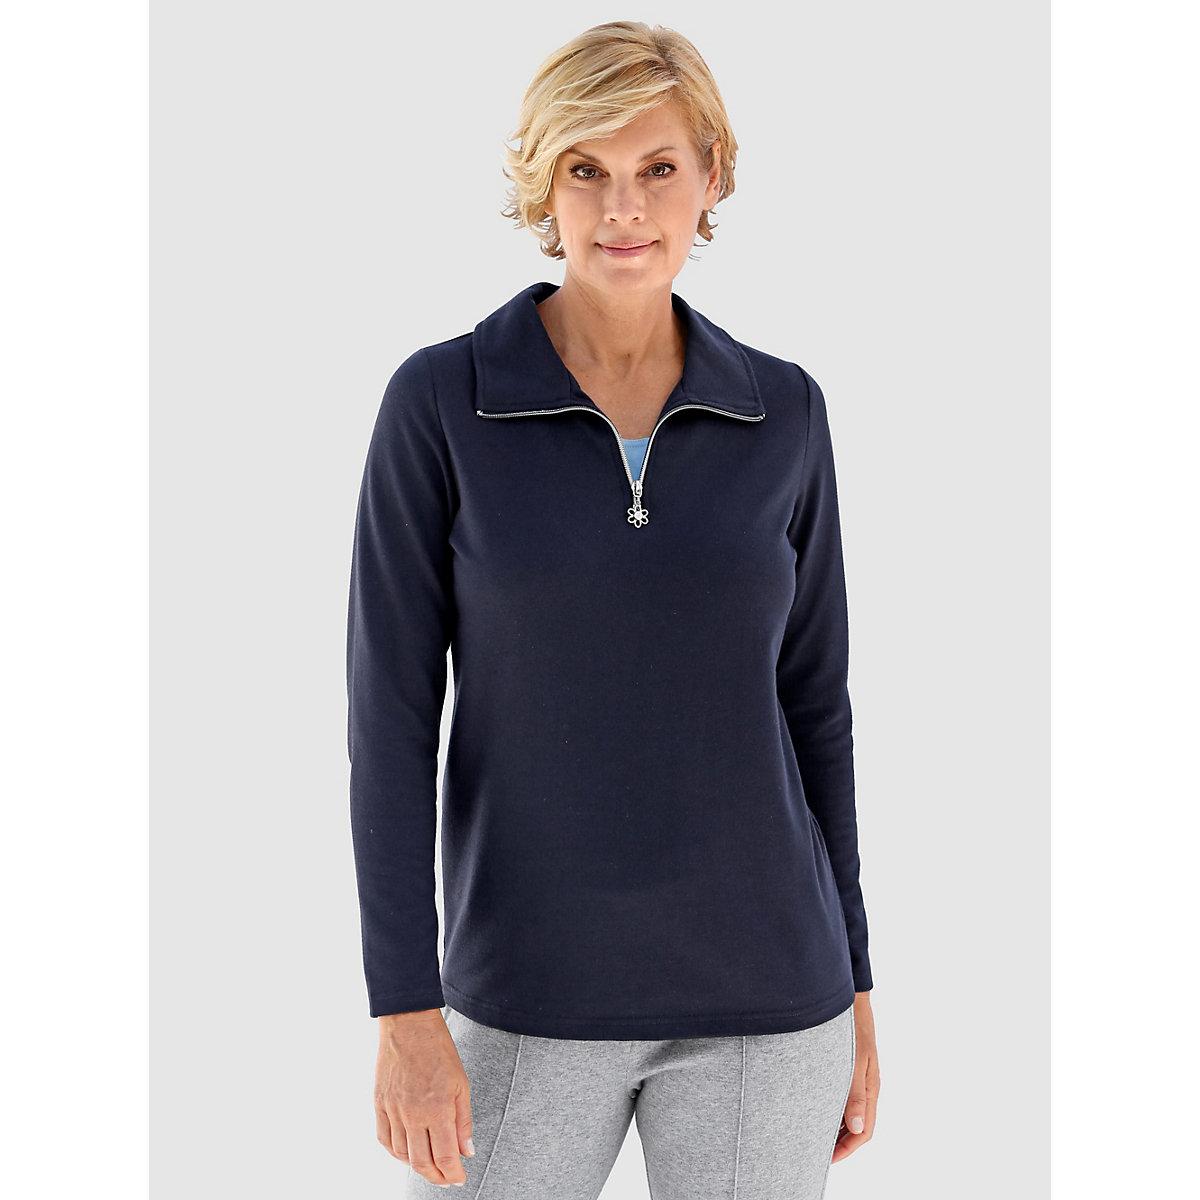 Paola Sweatshirt langarm uni Gerade blickdicht BaumwolleKunstfaser Sweatshirts blau